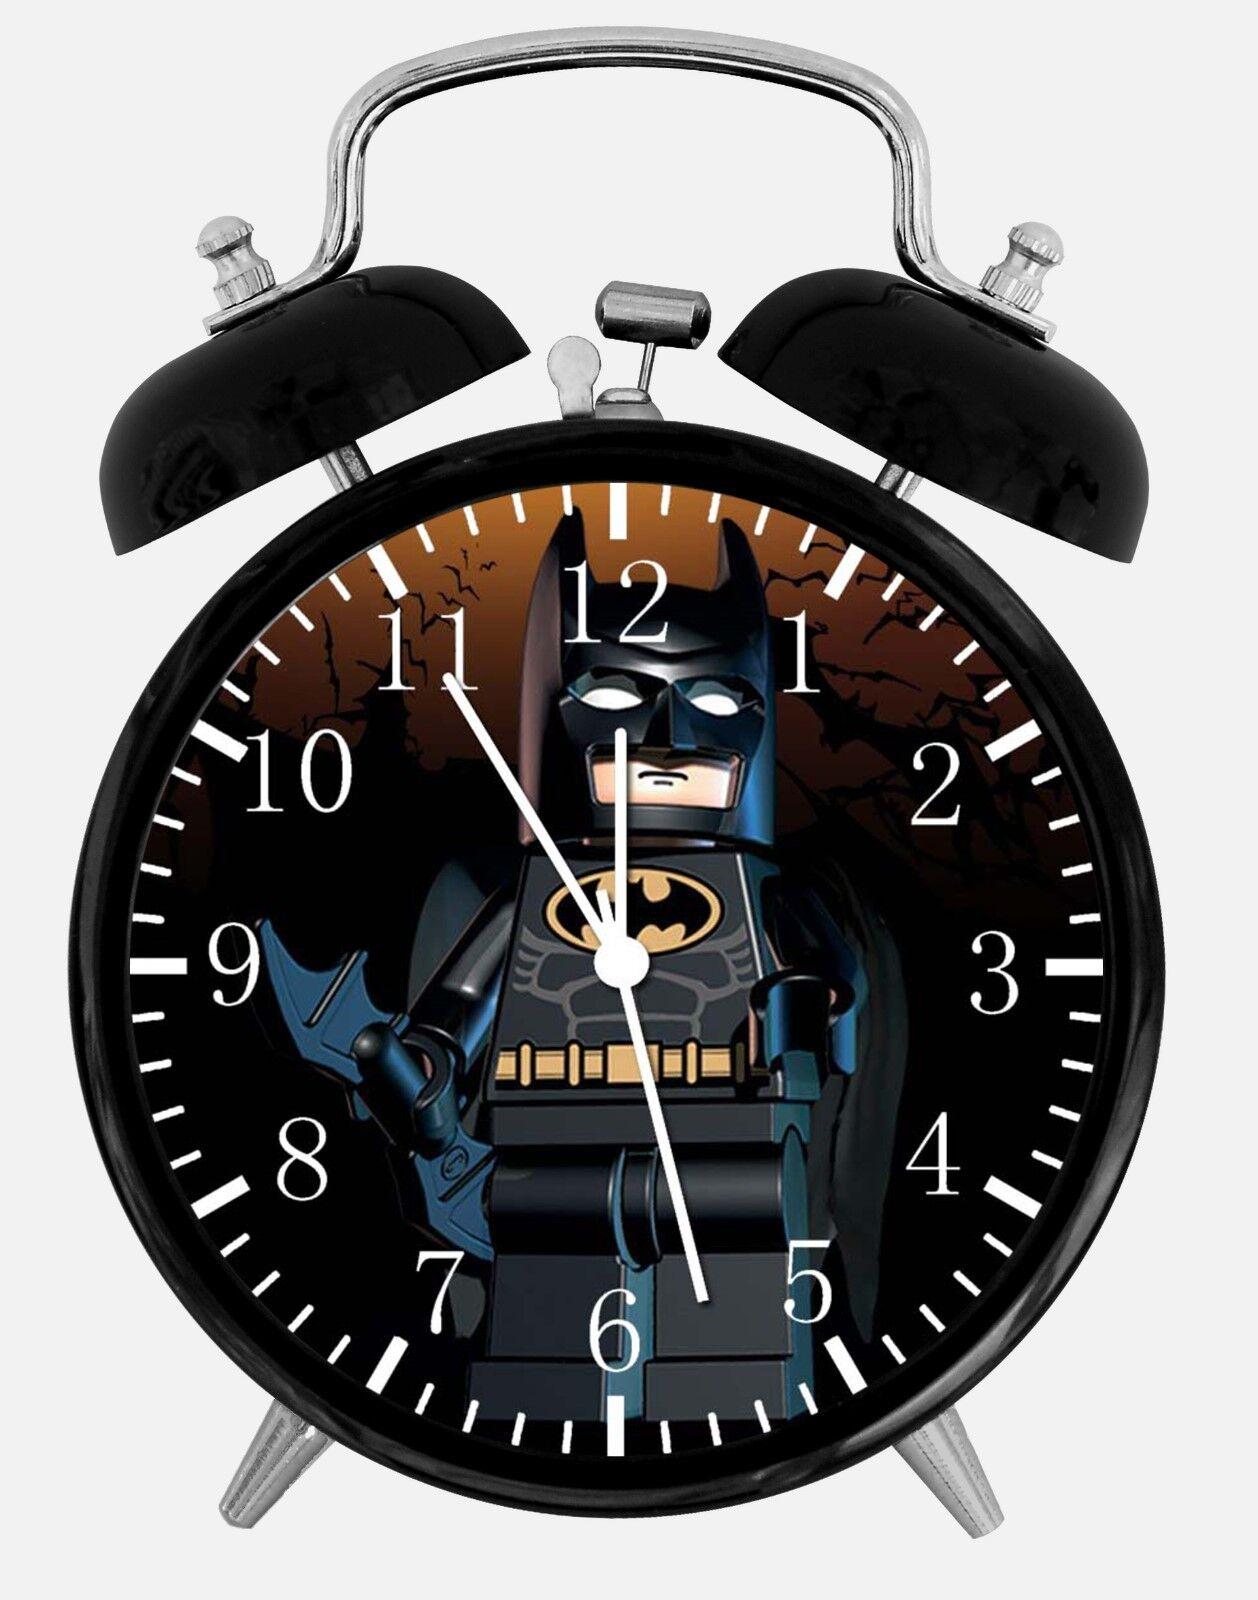 "Lego Batman Alarm Desk Clock 3.75"" Home or Office Decor W243 Nice For Gift"